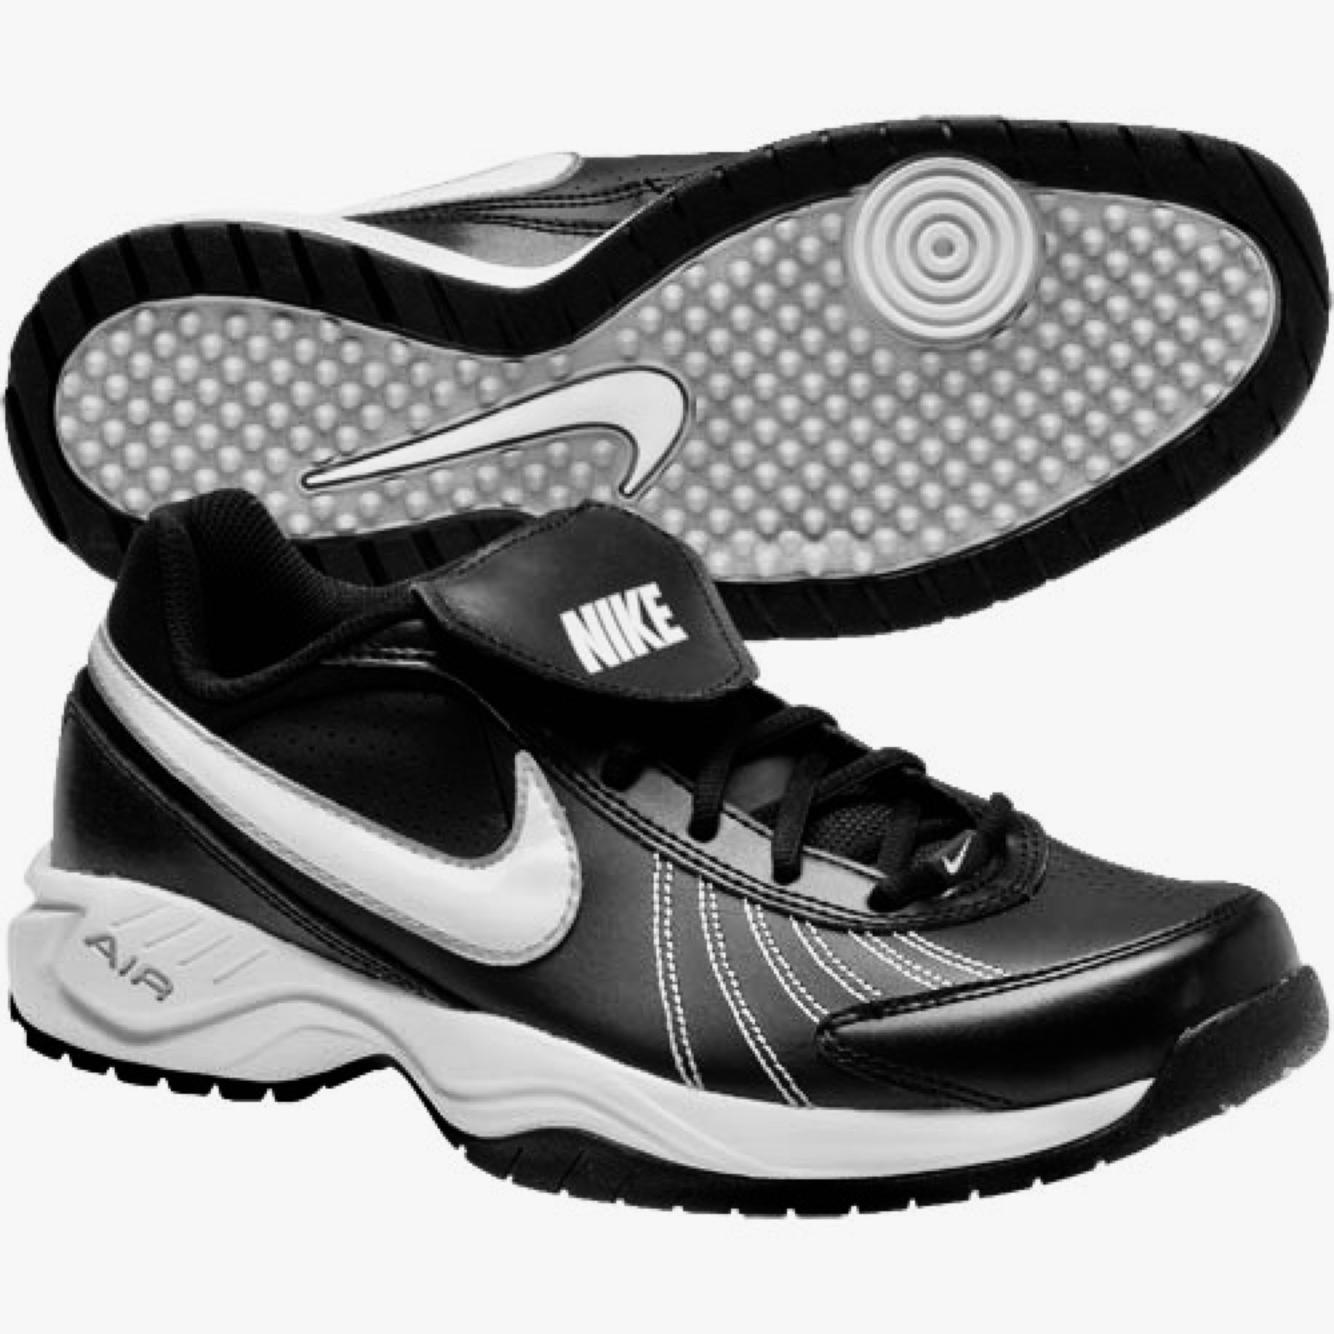 Nike Men's Air Diamond Turf Shoes Size